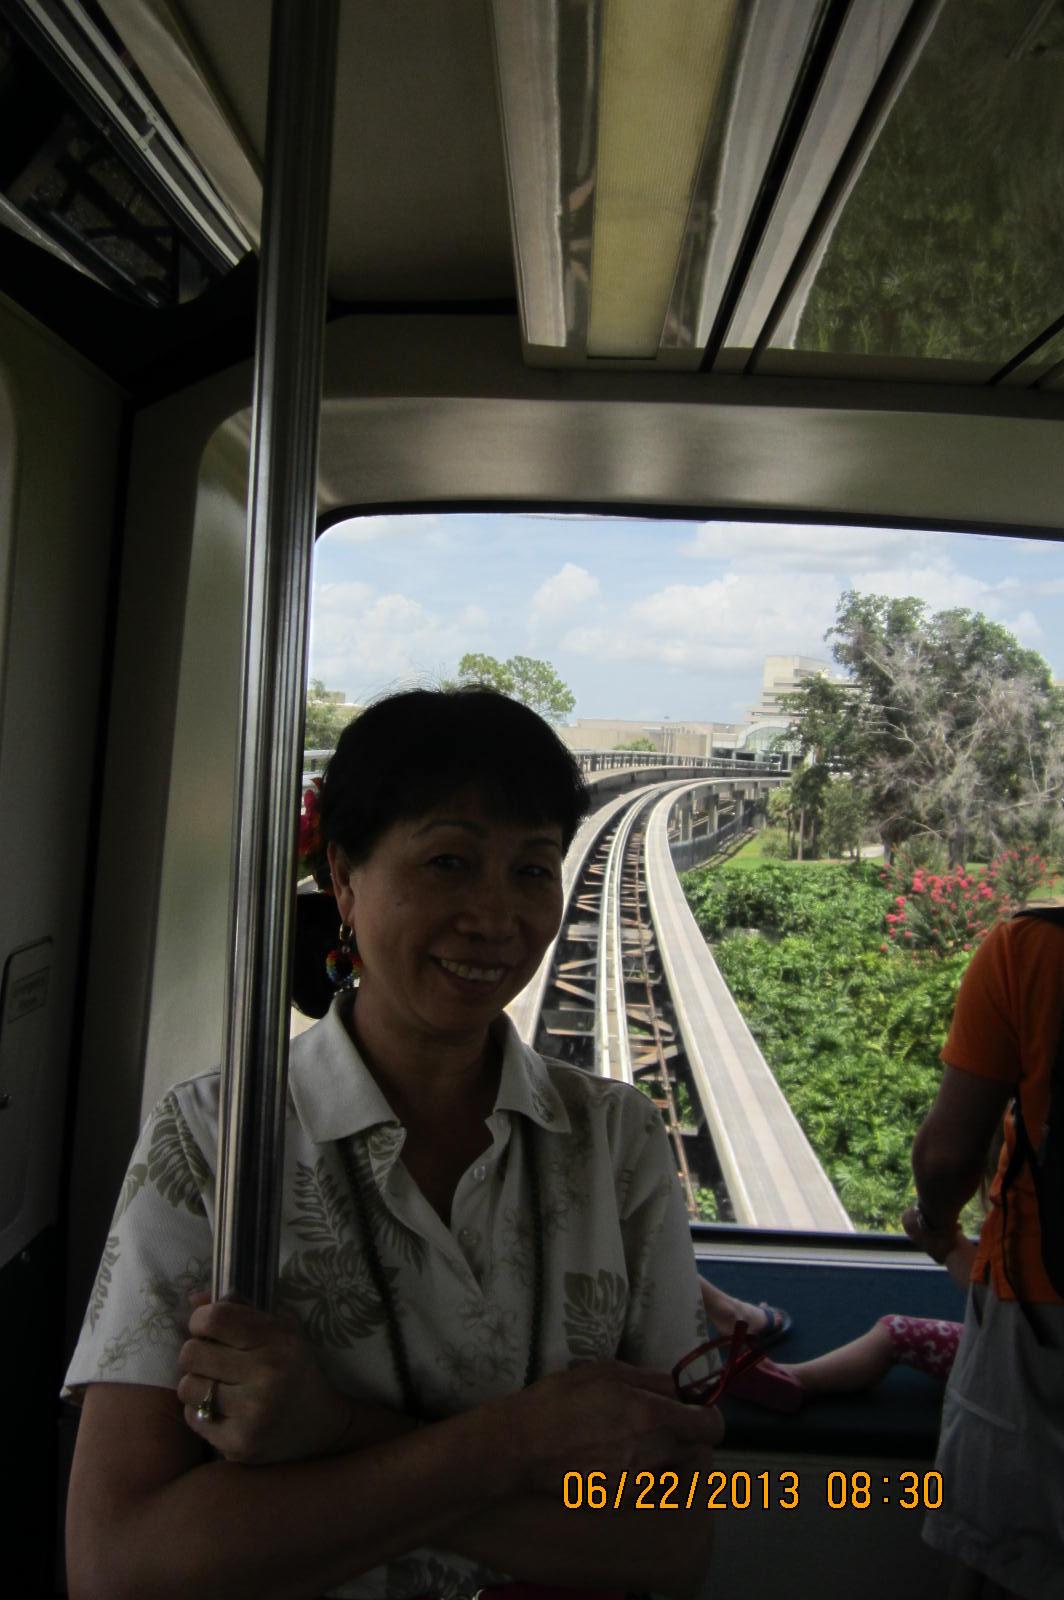 in Orlando.. Monorail